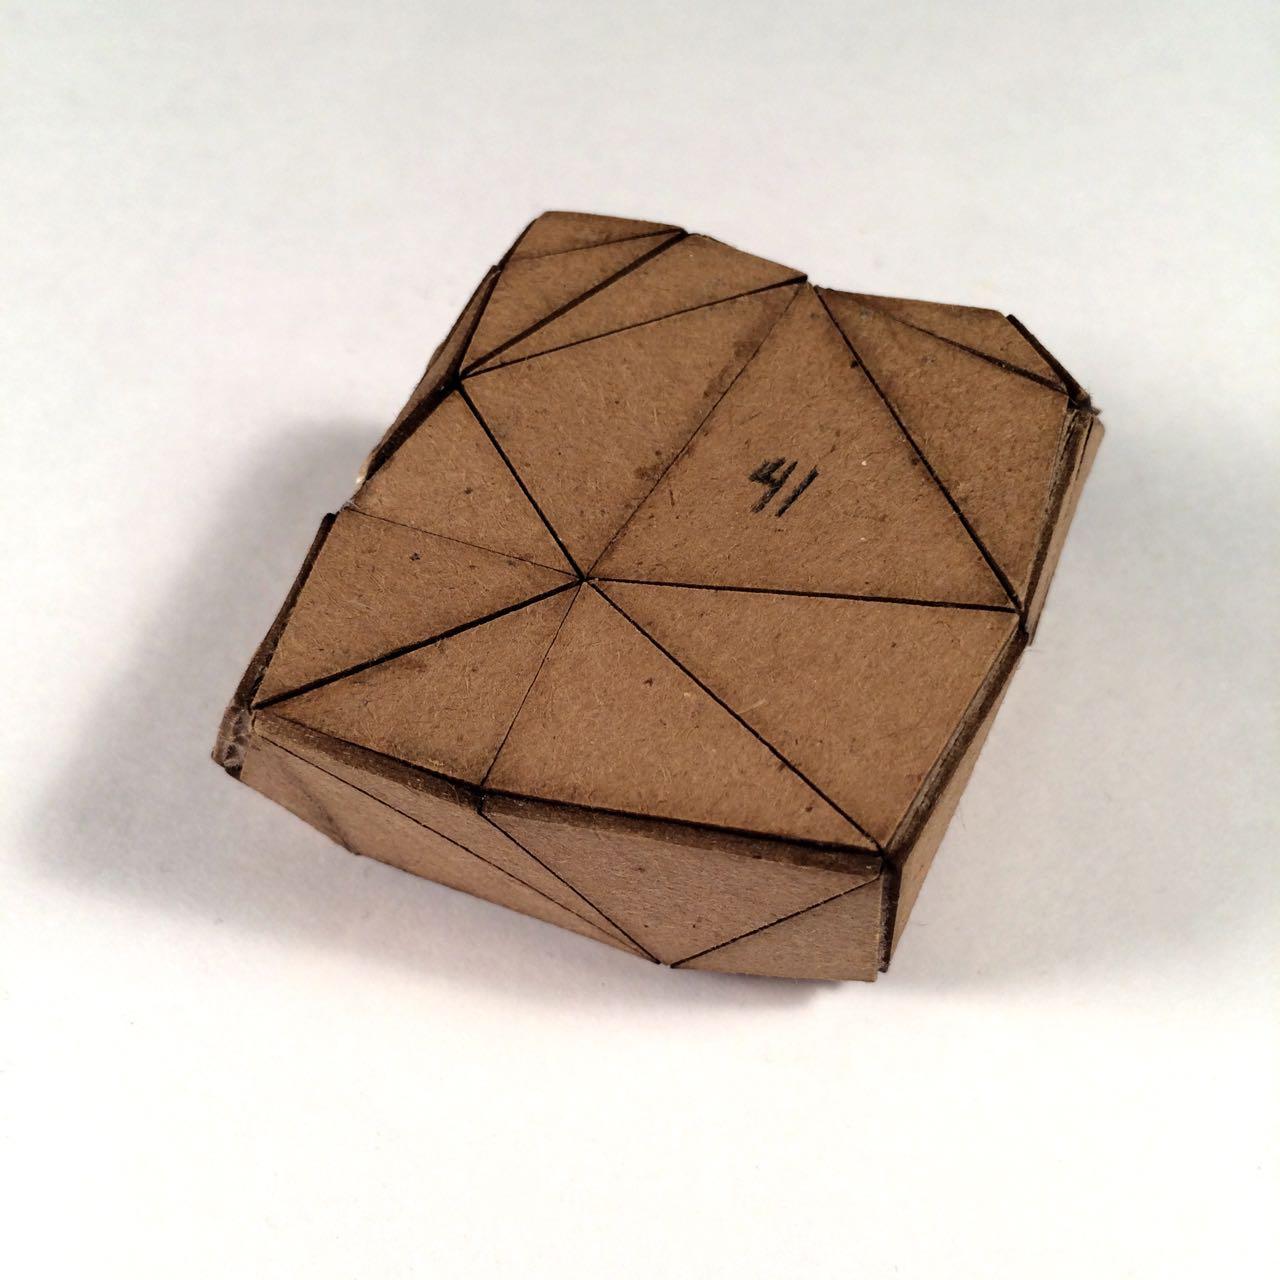 (Front view) 024 - Boxes For Rocks, 2012, laser cut cardboard, found rocks, glue, 9cm x 7cm x 3cm (flat bottom), 250 CAD